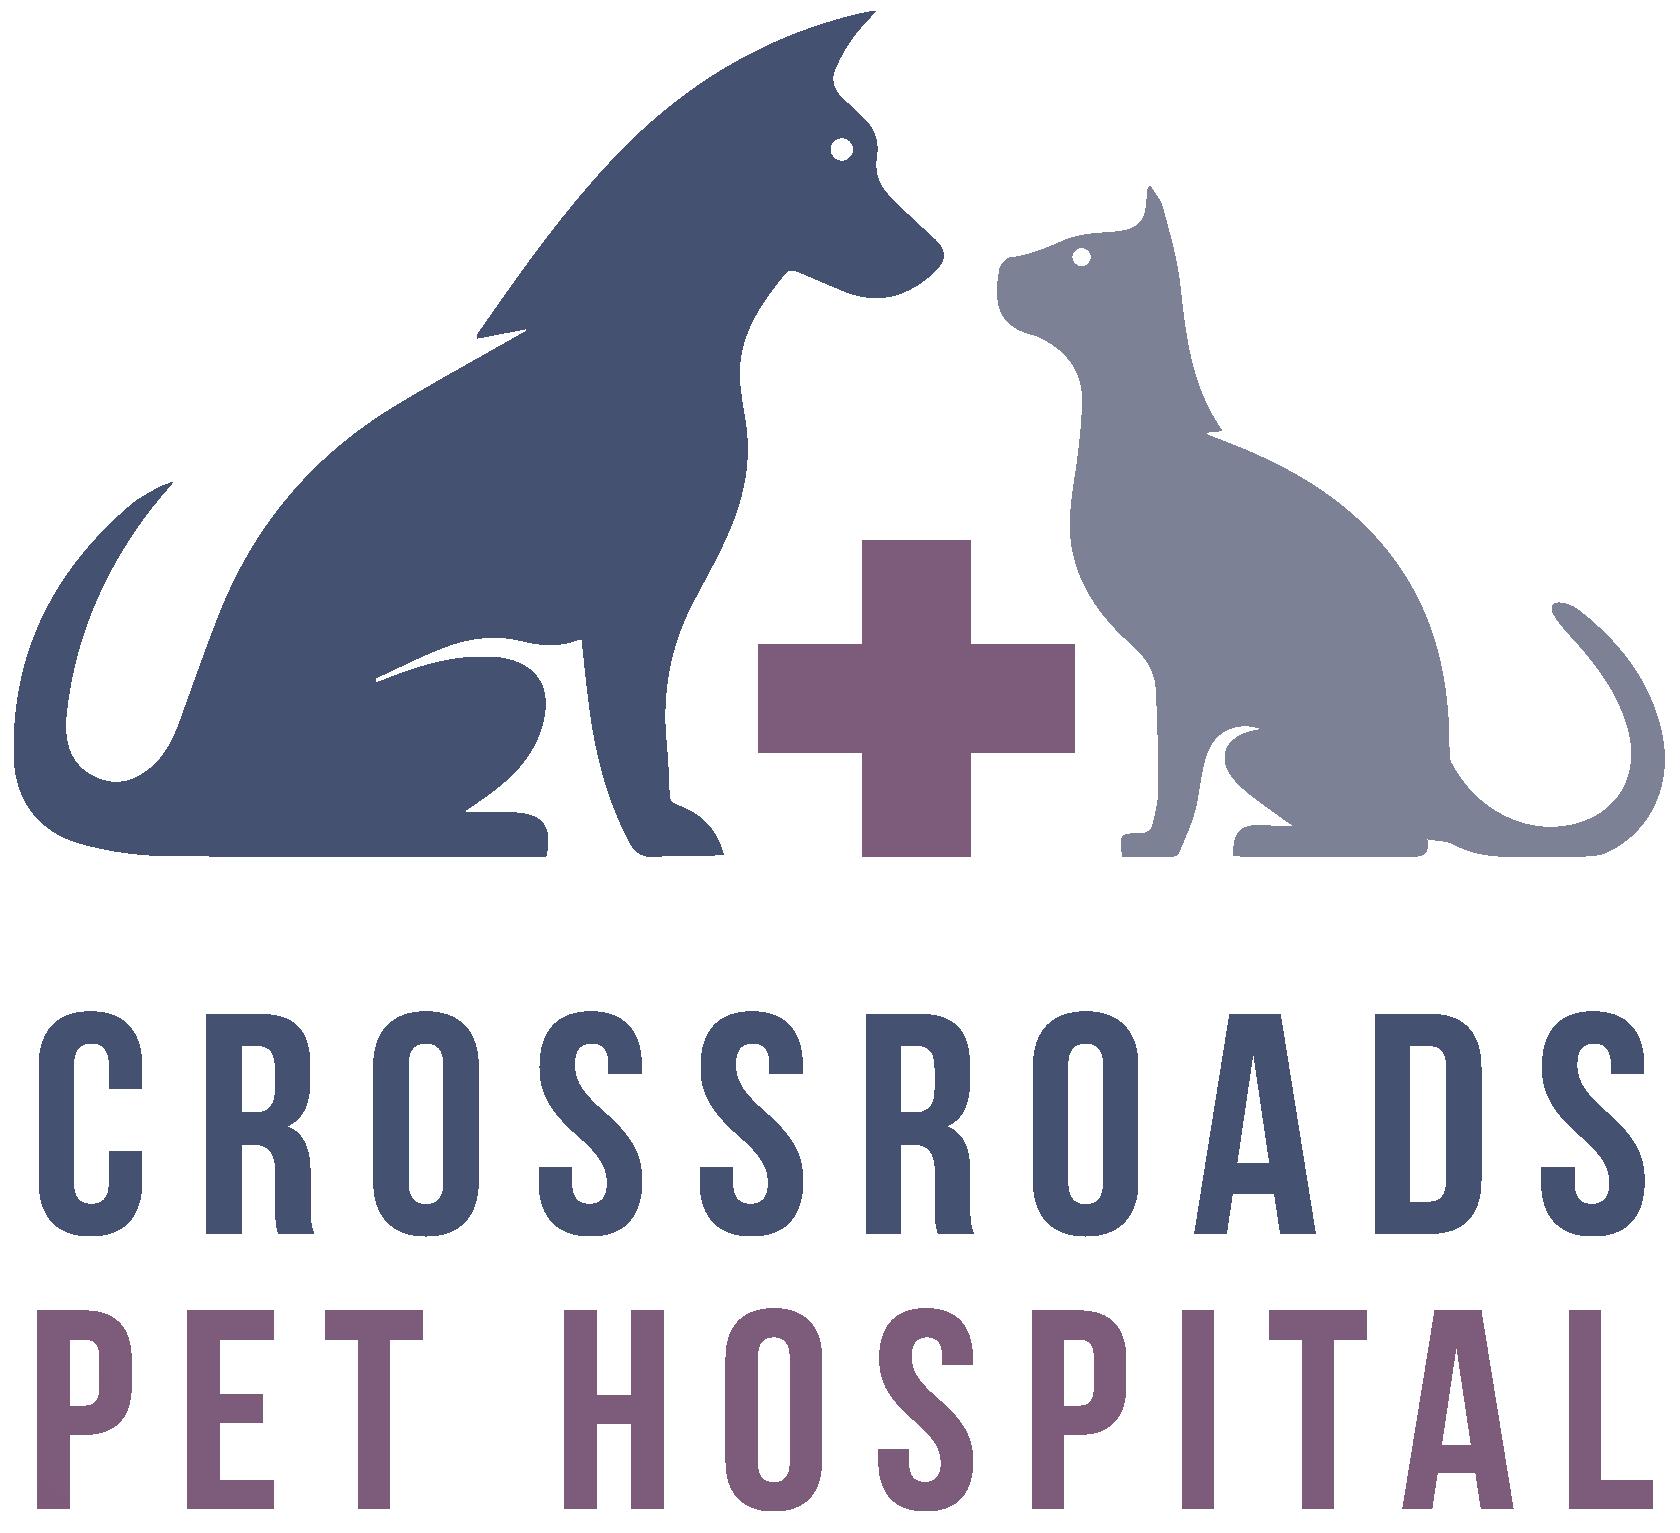 crossroads-pet-hospital-carrollton-tx-logo-2tone